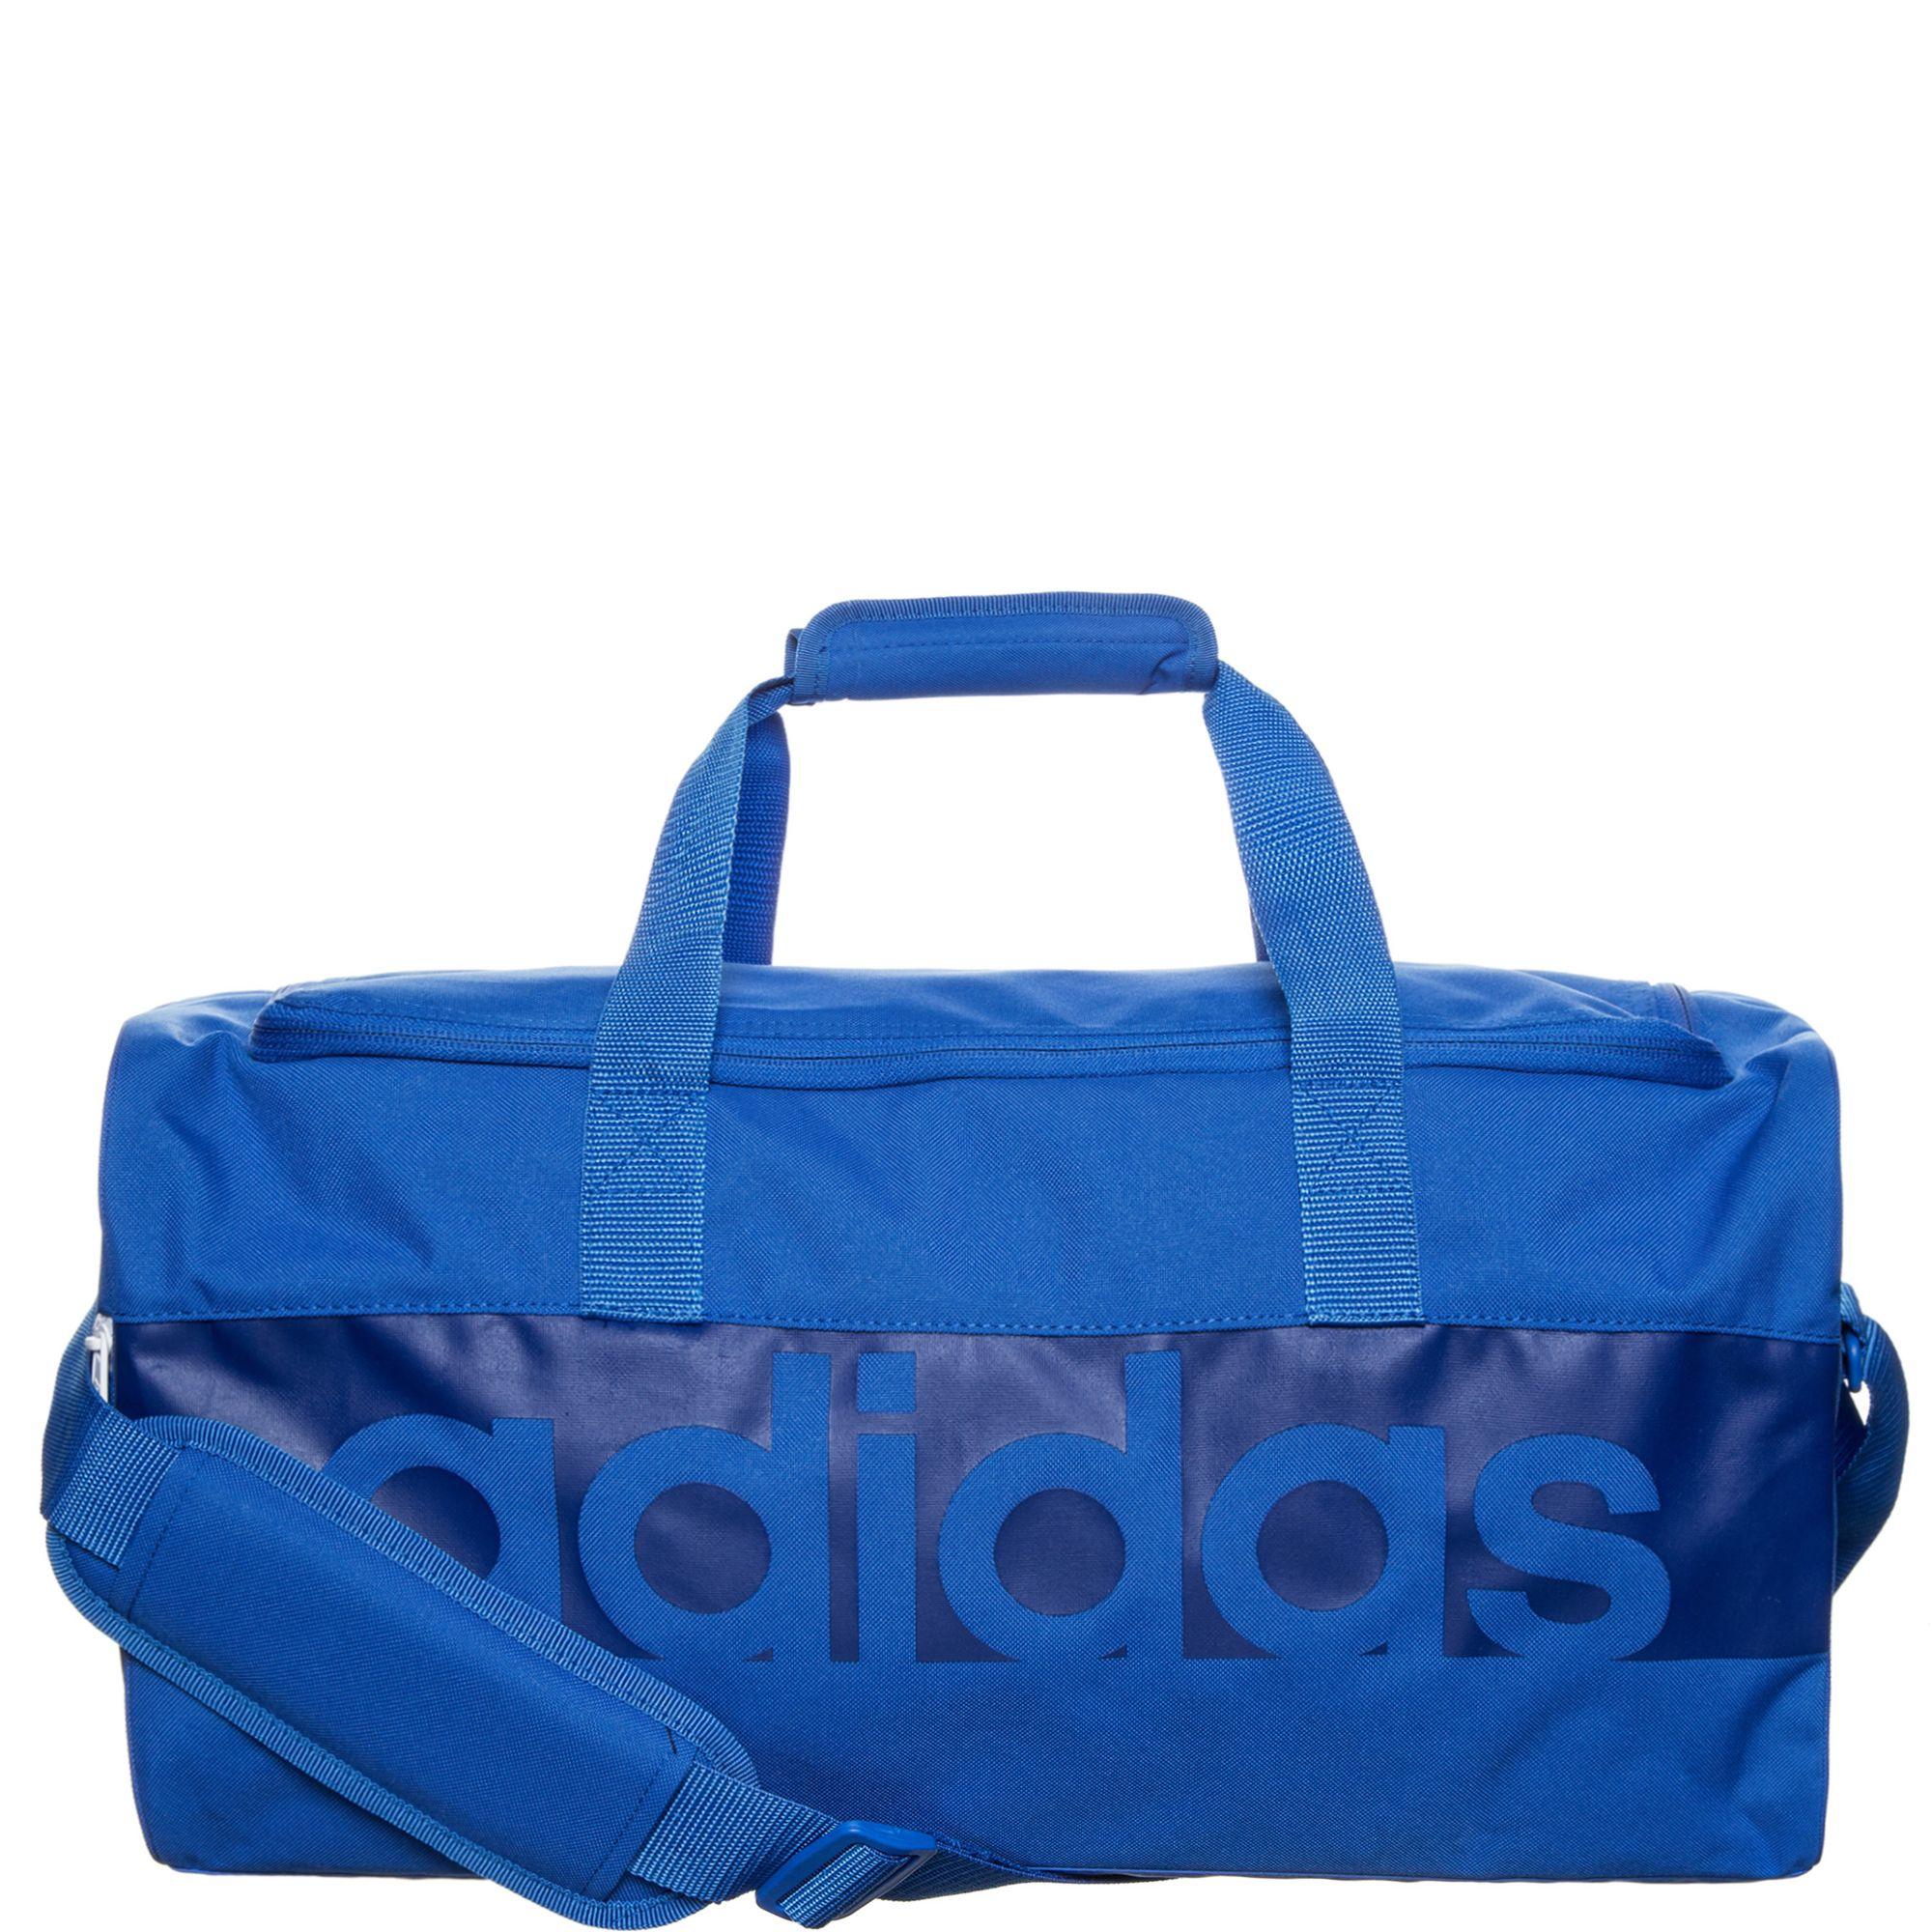 ADIDAS PERFORMANCE adidas Performance Tiro Linear Teambag Medium Fußballtasche